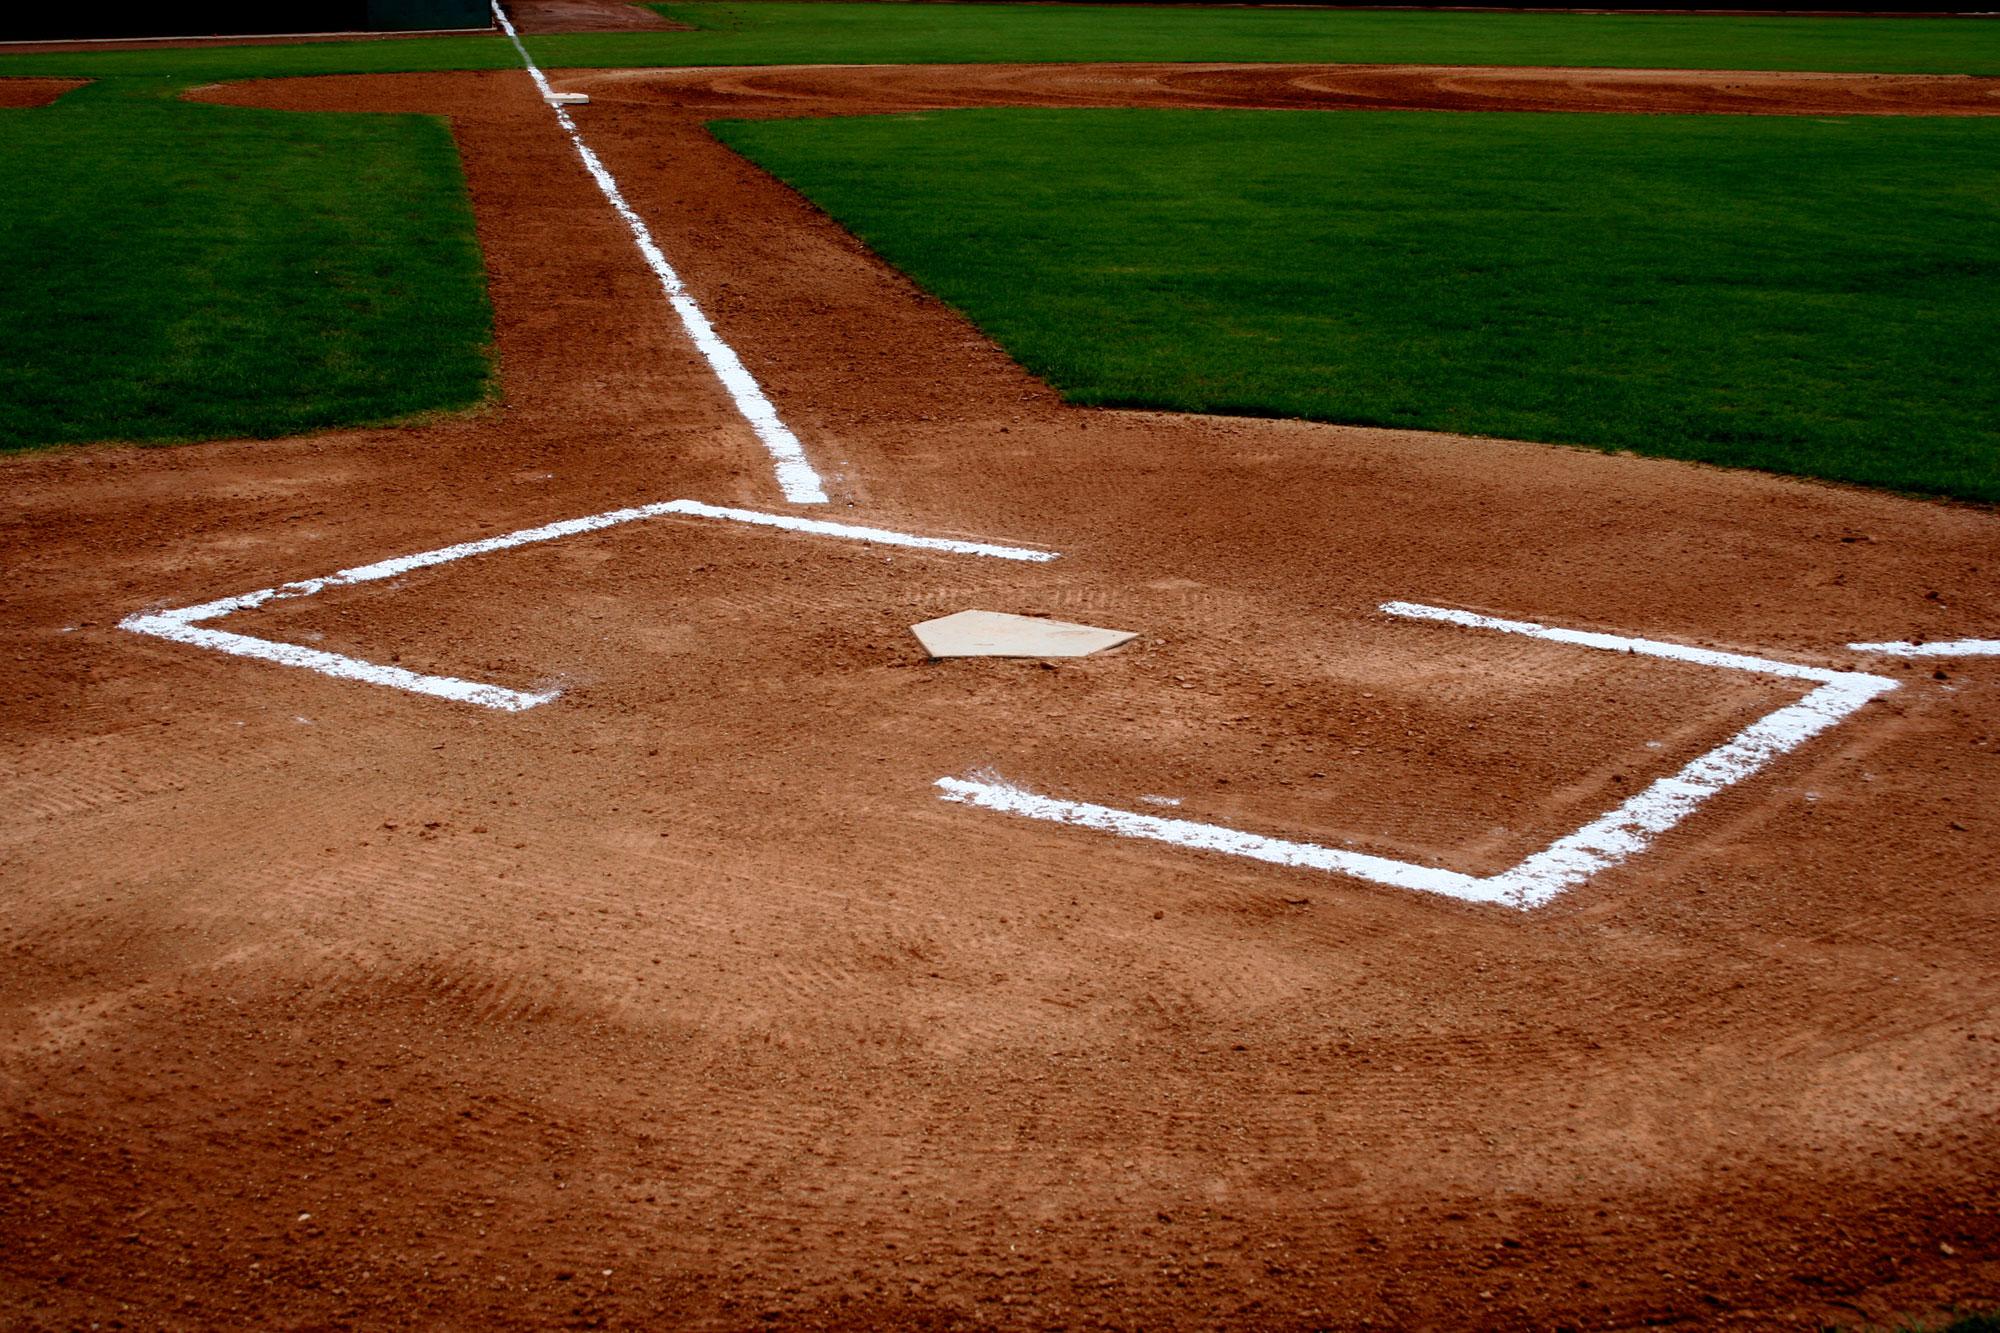 stadium_baseball-1